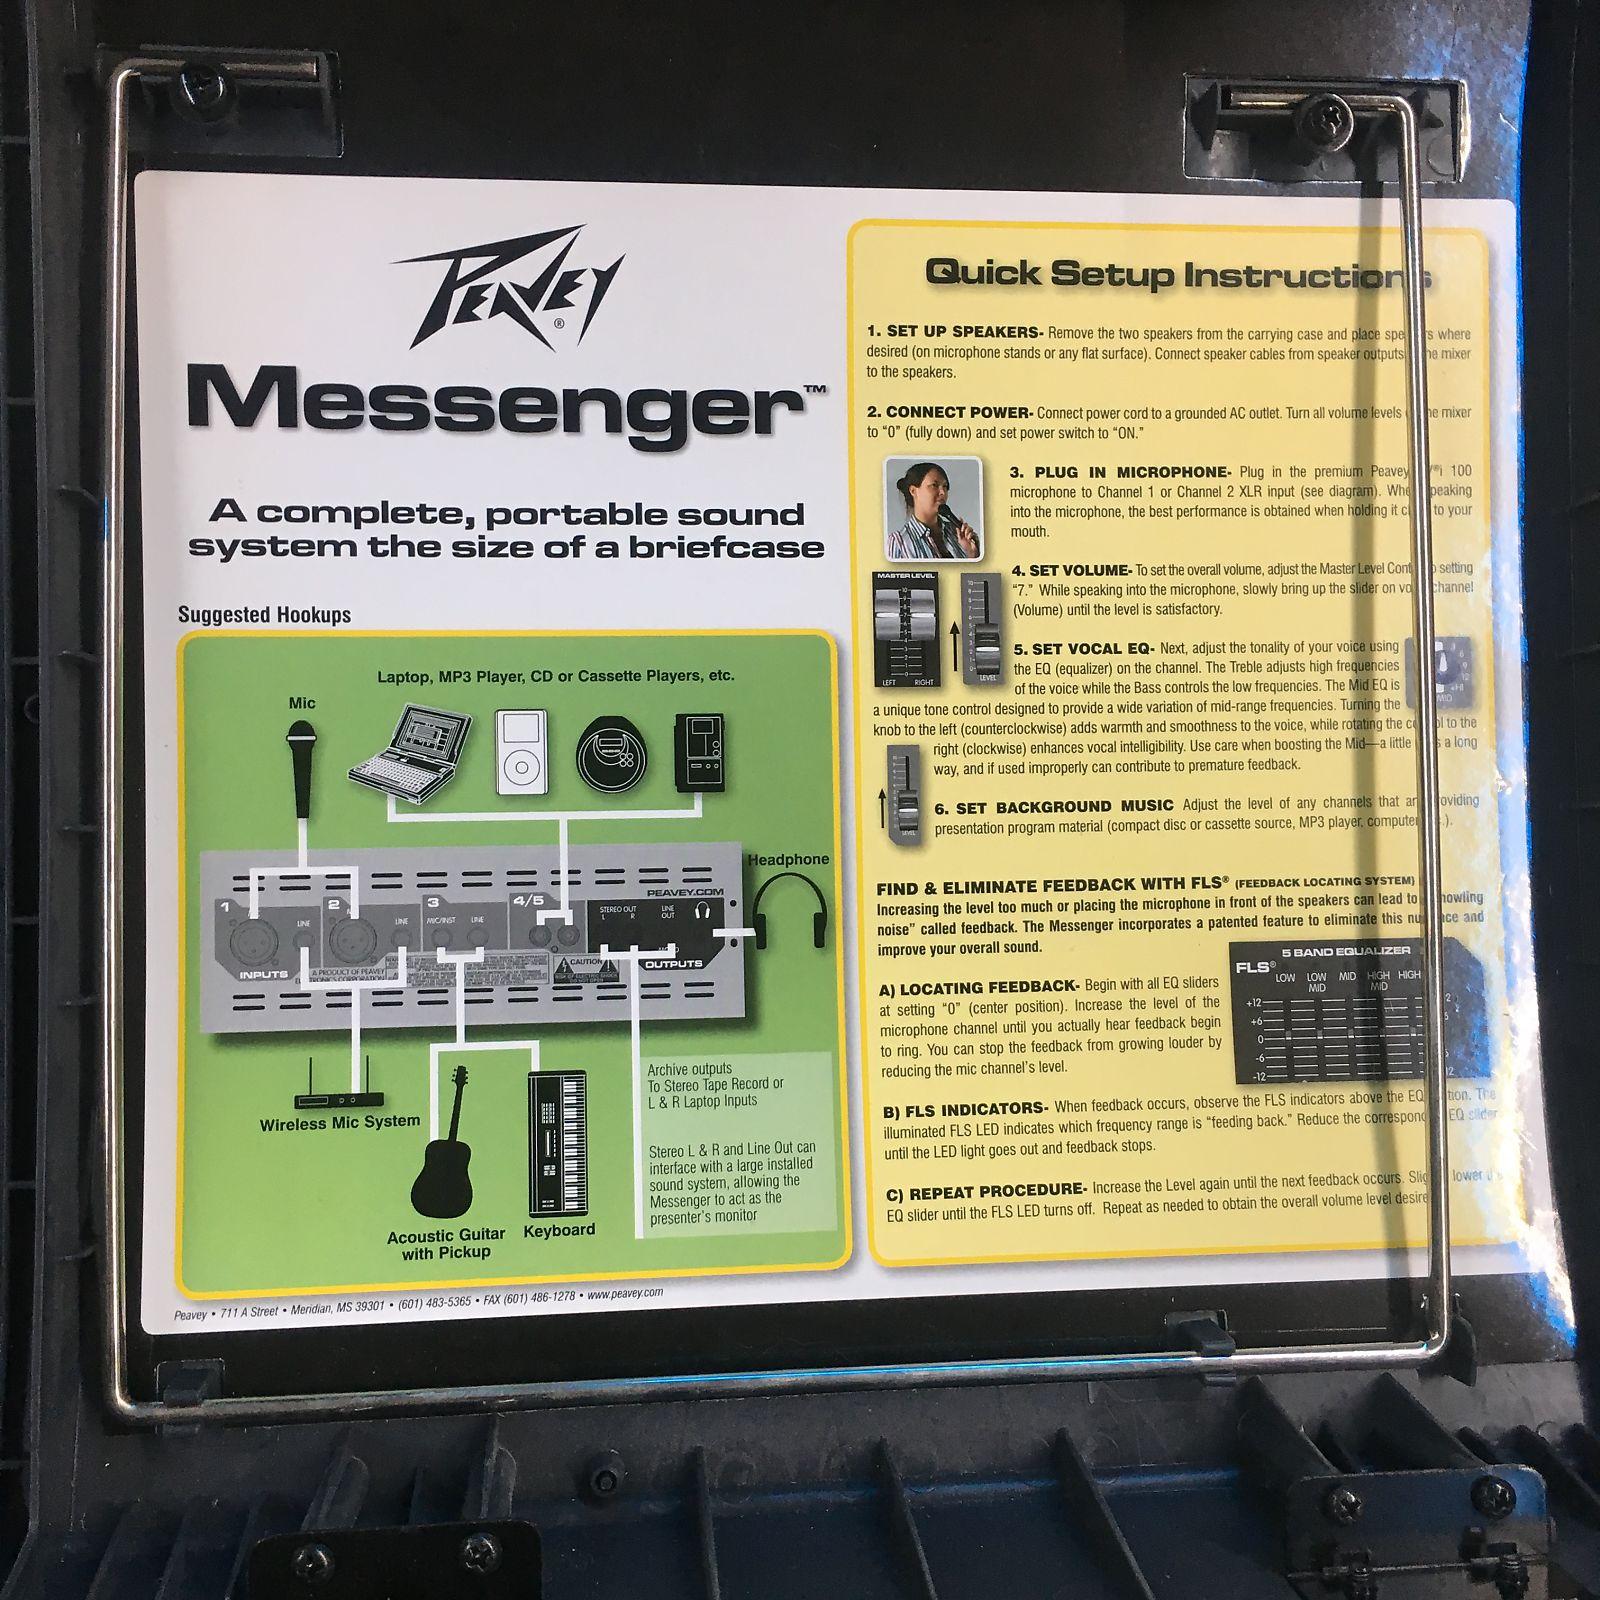 Peavey Messenger Portable Sound System 1 Set